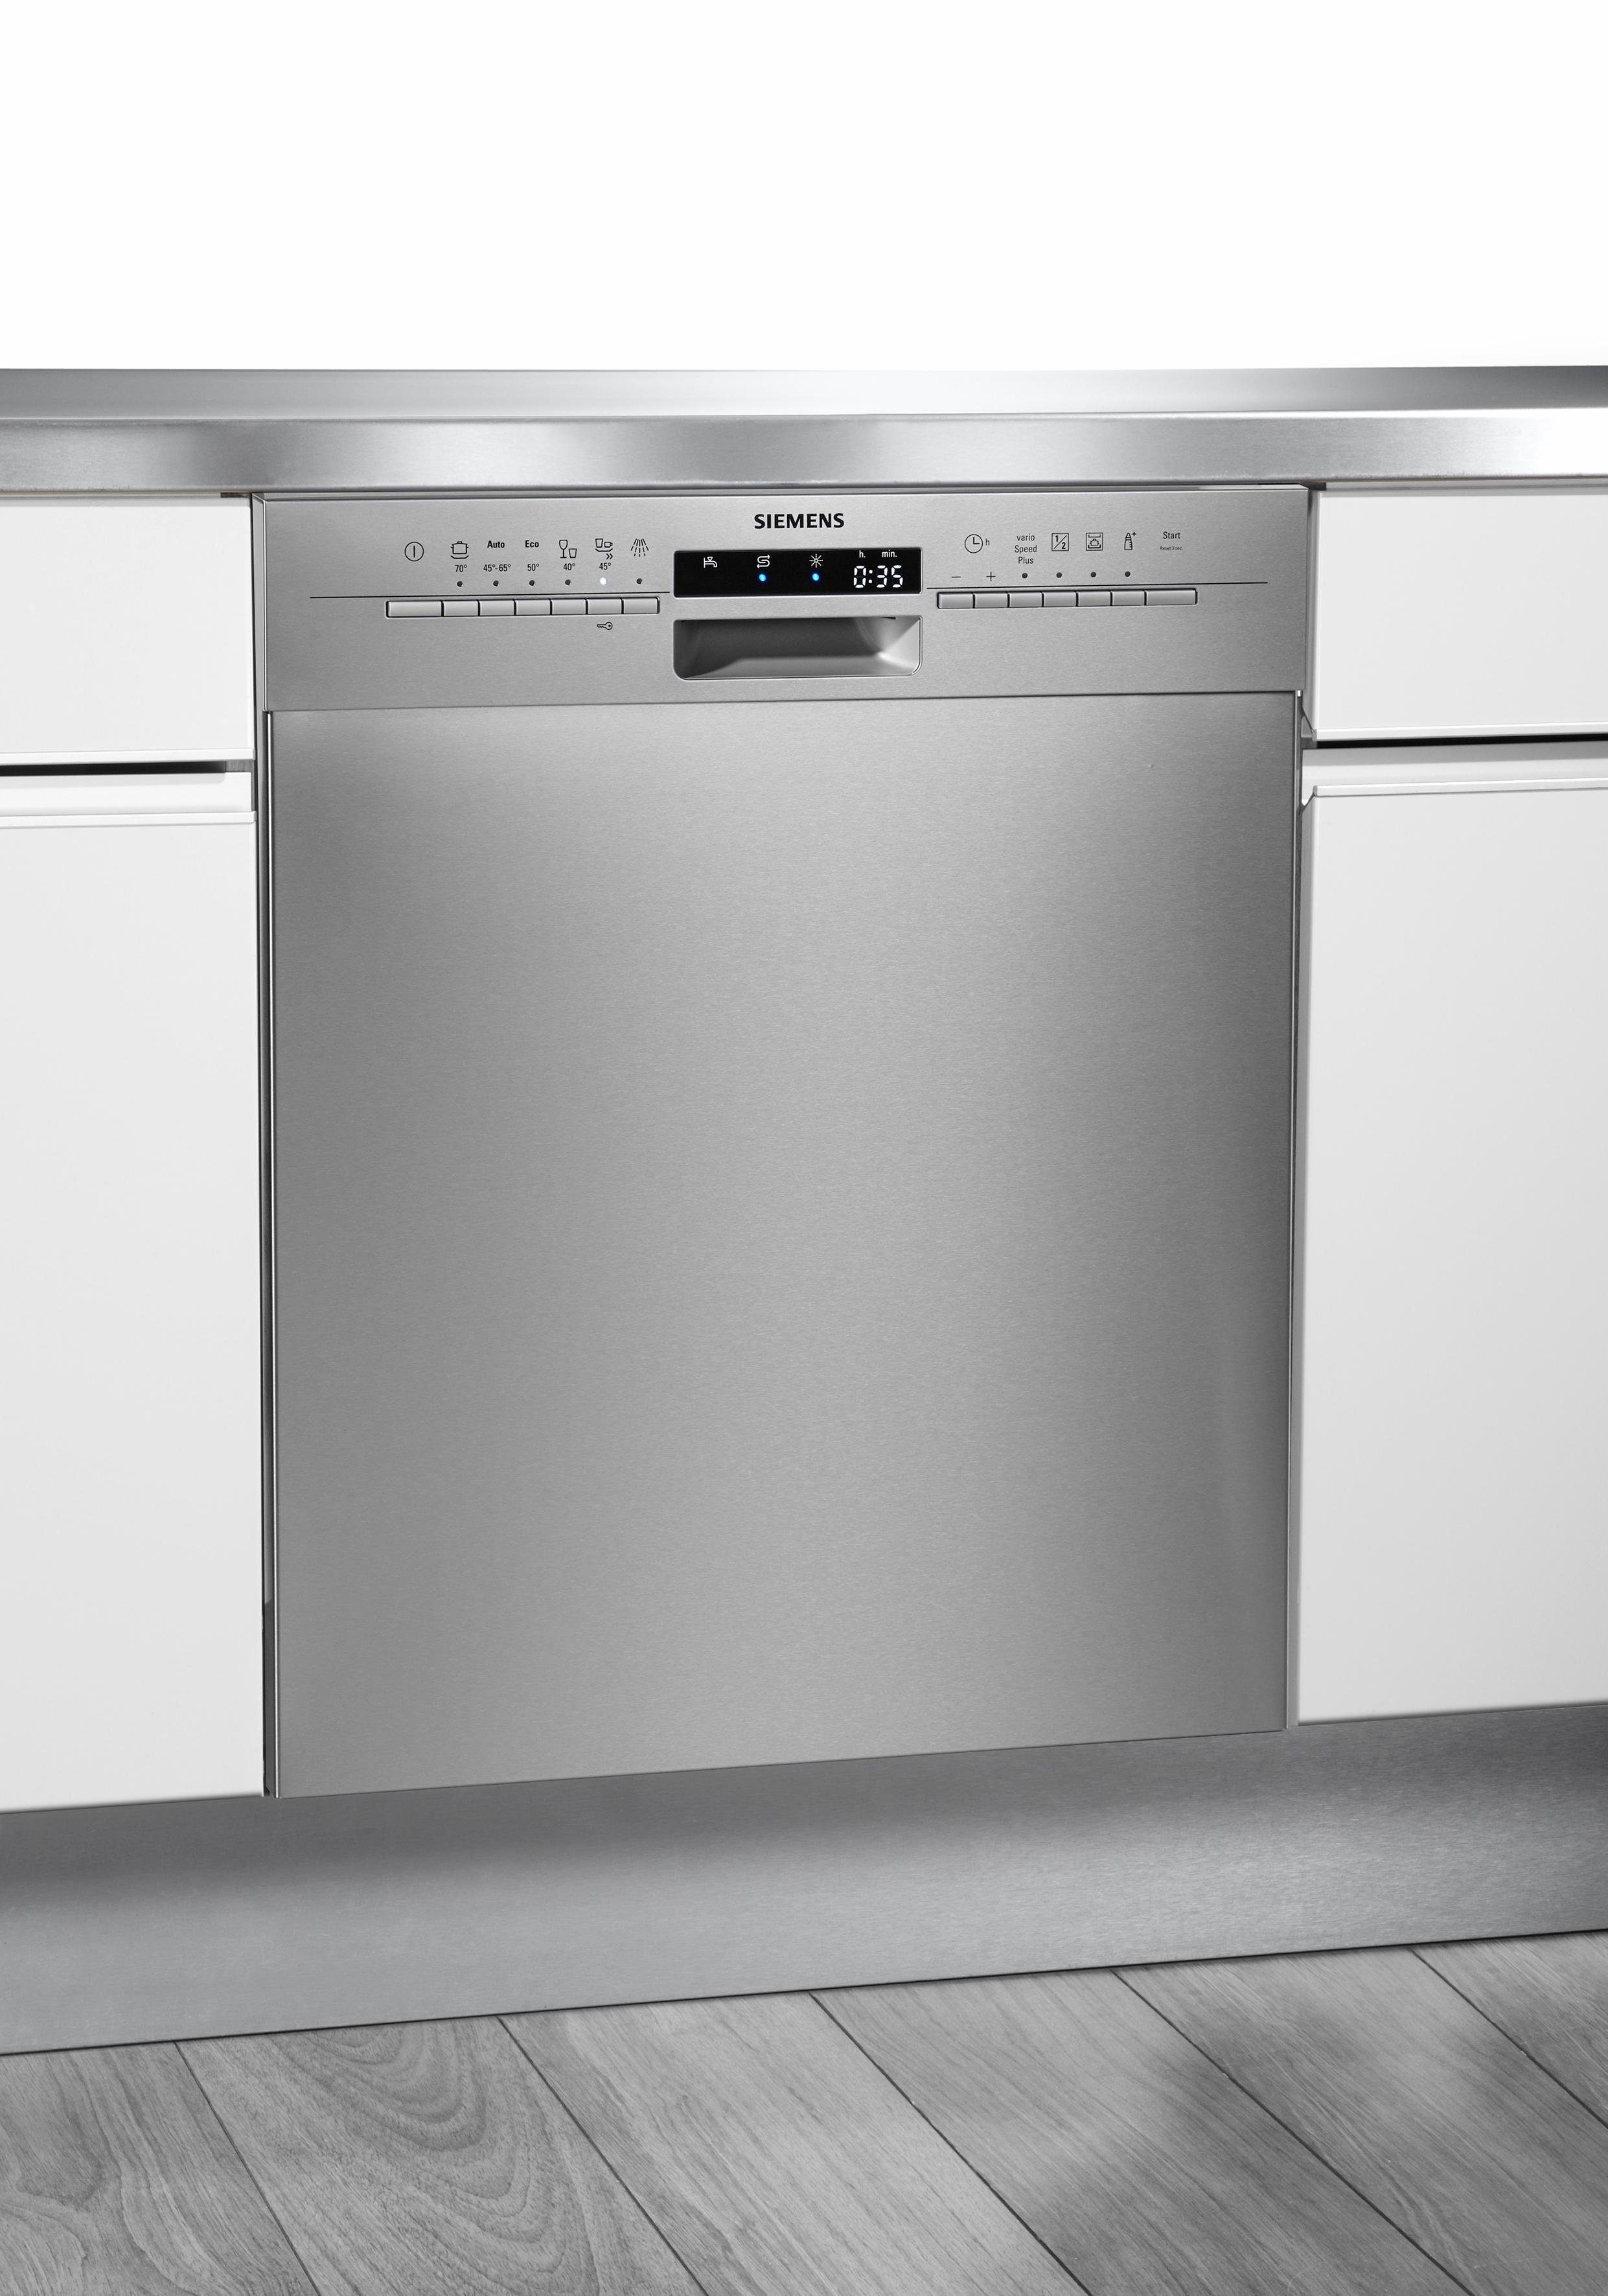 Siemens Unterbau-Geschirrspüler SN46L500EU, A++, 7,5 Liter, 12 Maßgedecke